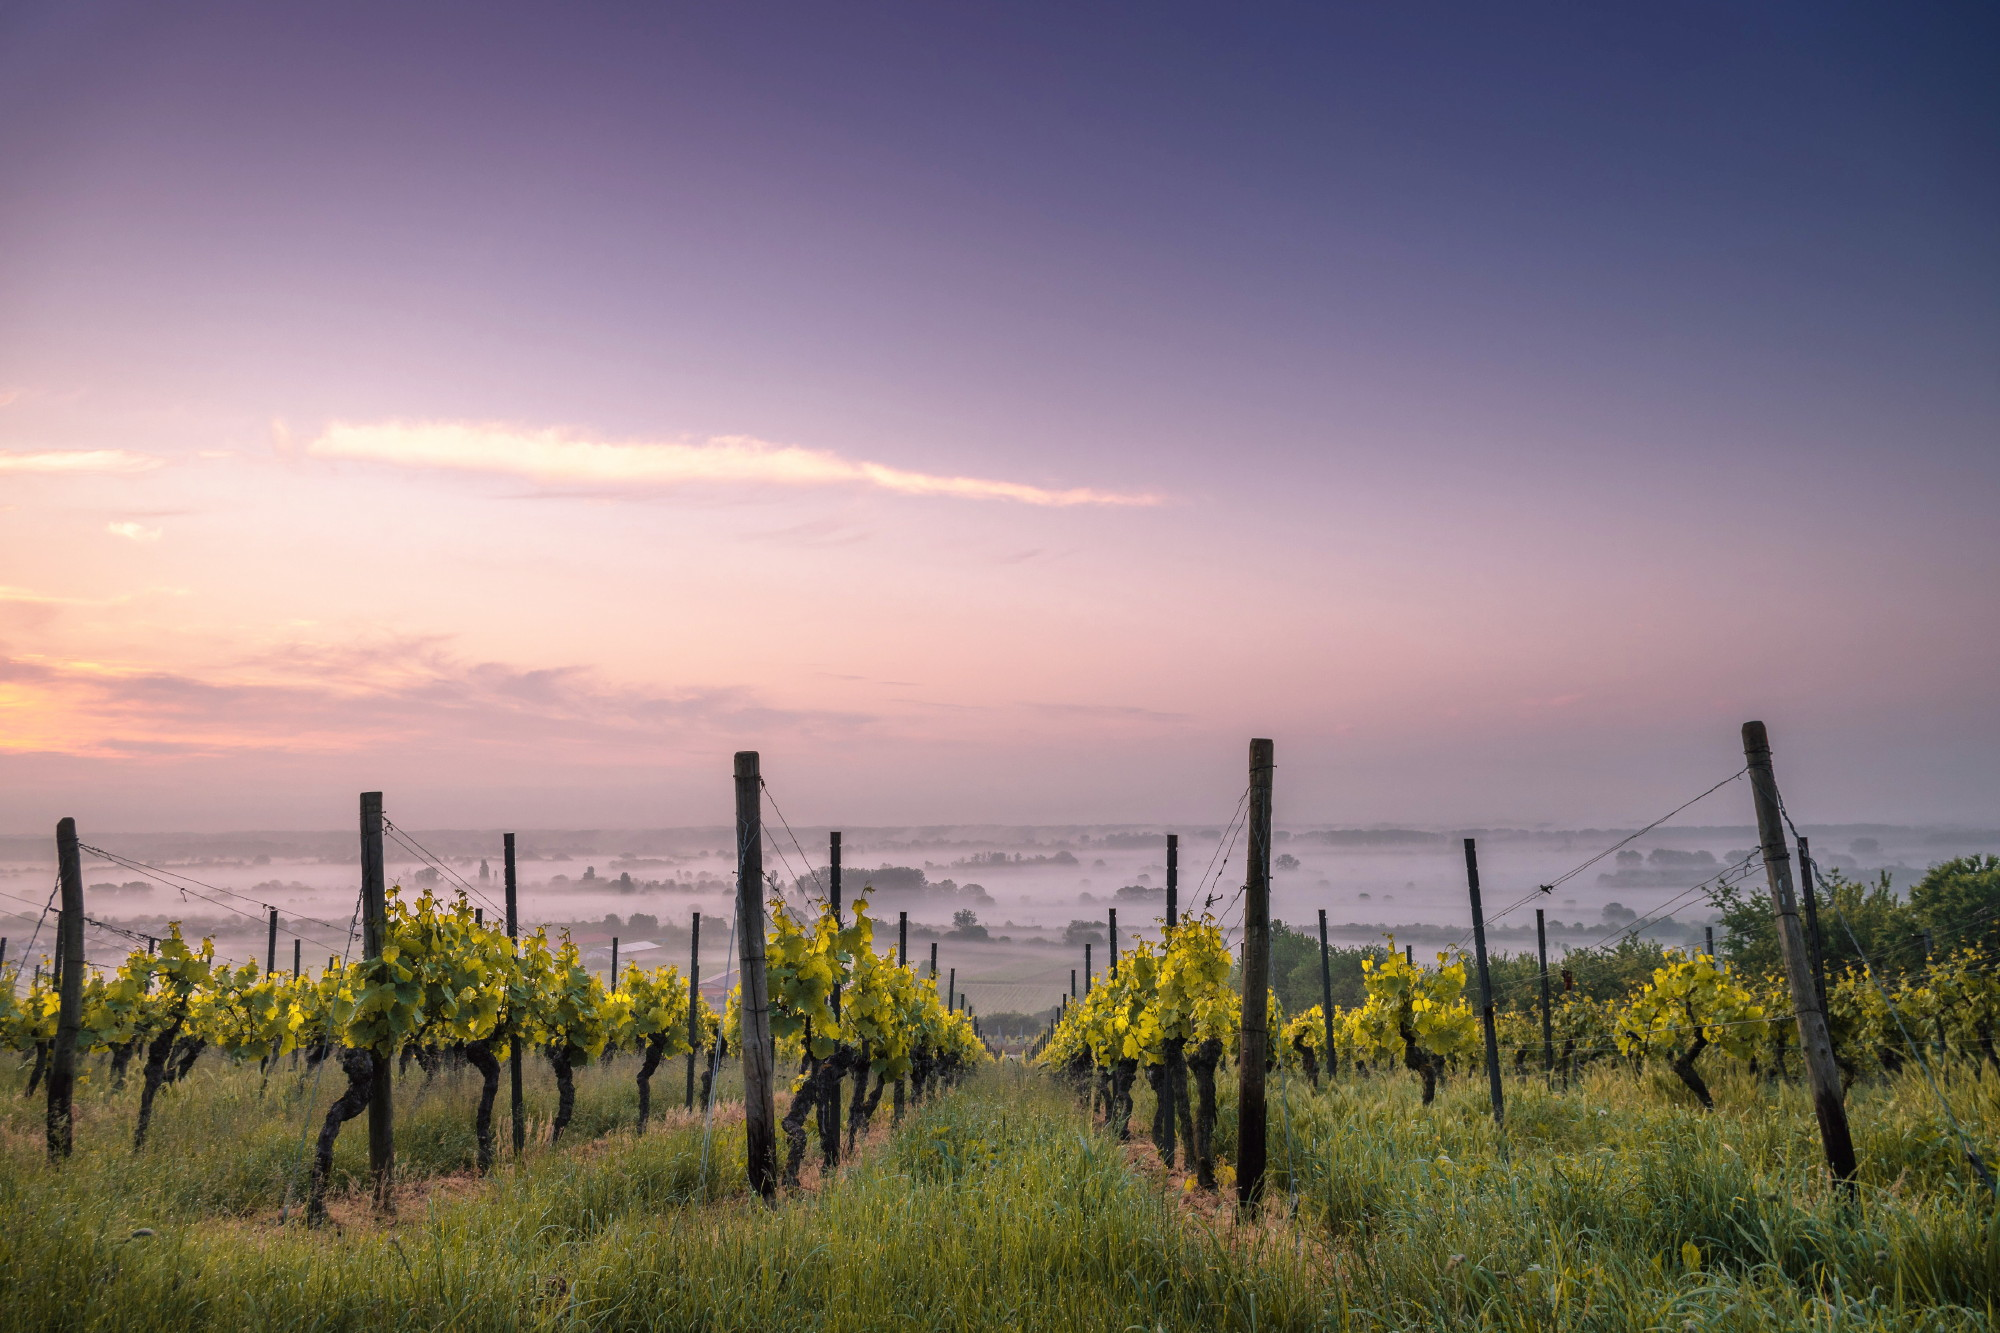 Wine, Uruguay New Travel Destination